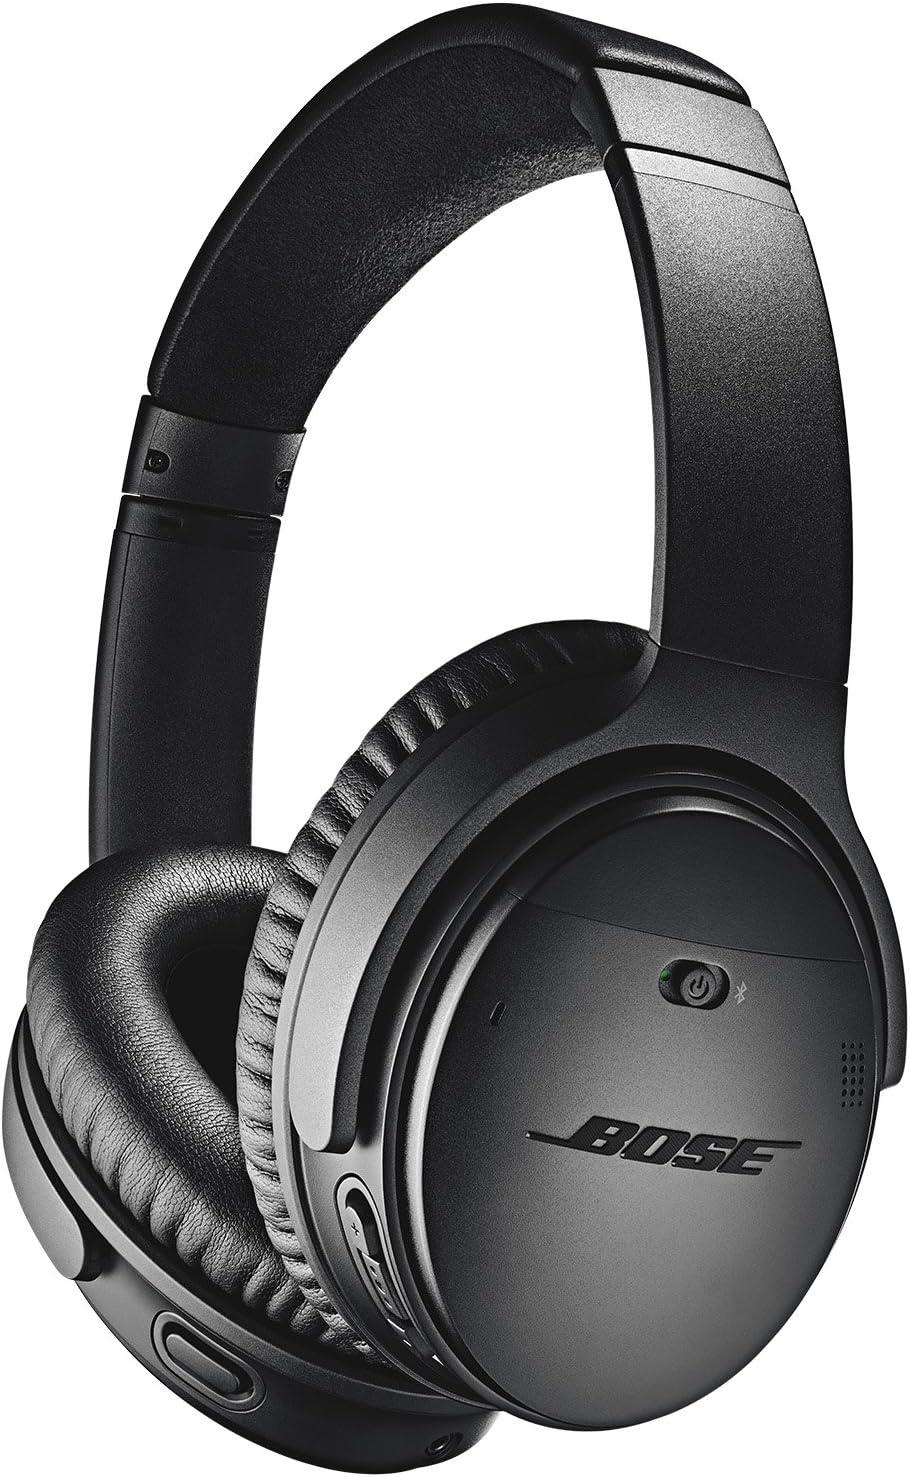 Bose QuietComfort 35 II Wireless Bluetooth Headphones, Noise-Cancelling, with Alexa Voice Control - Black